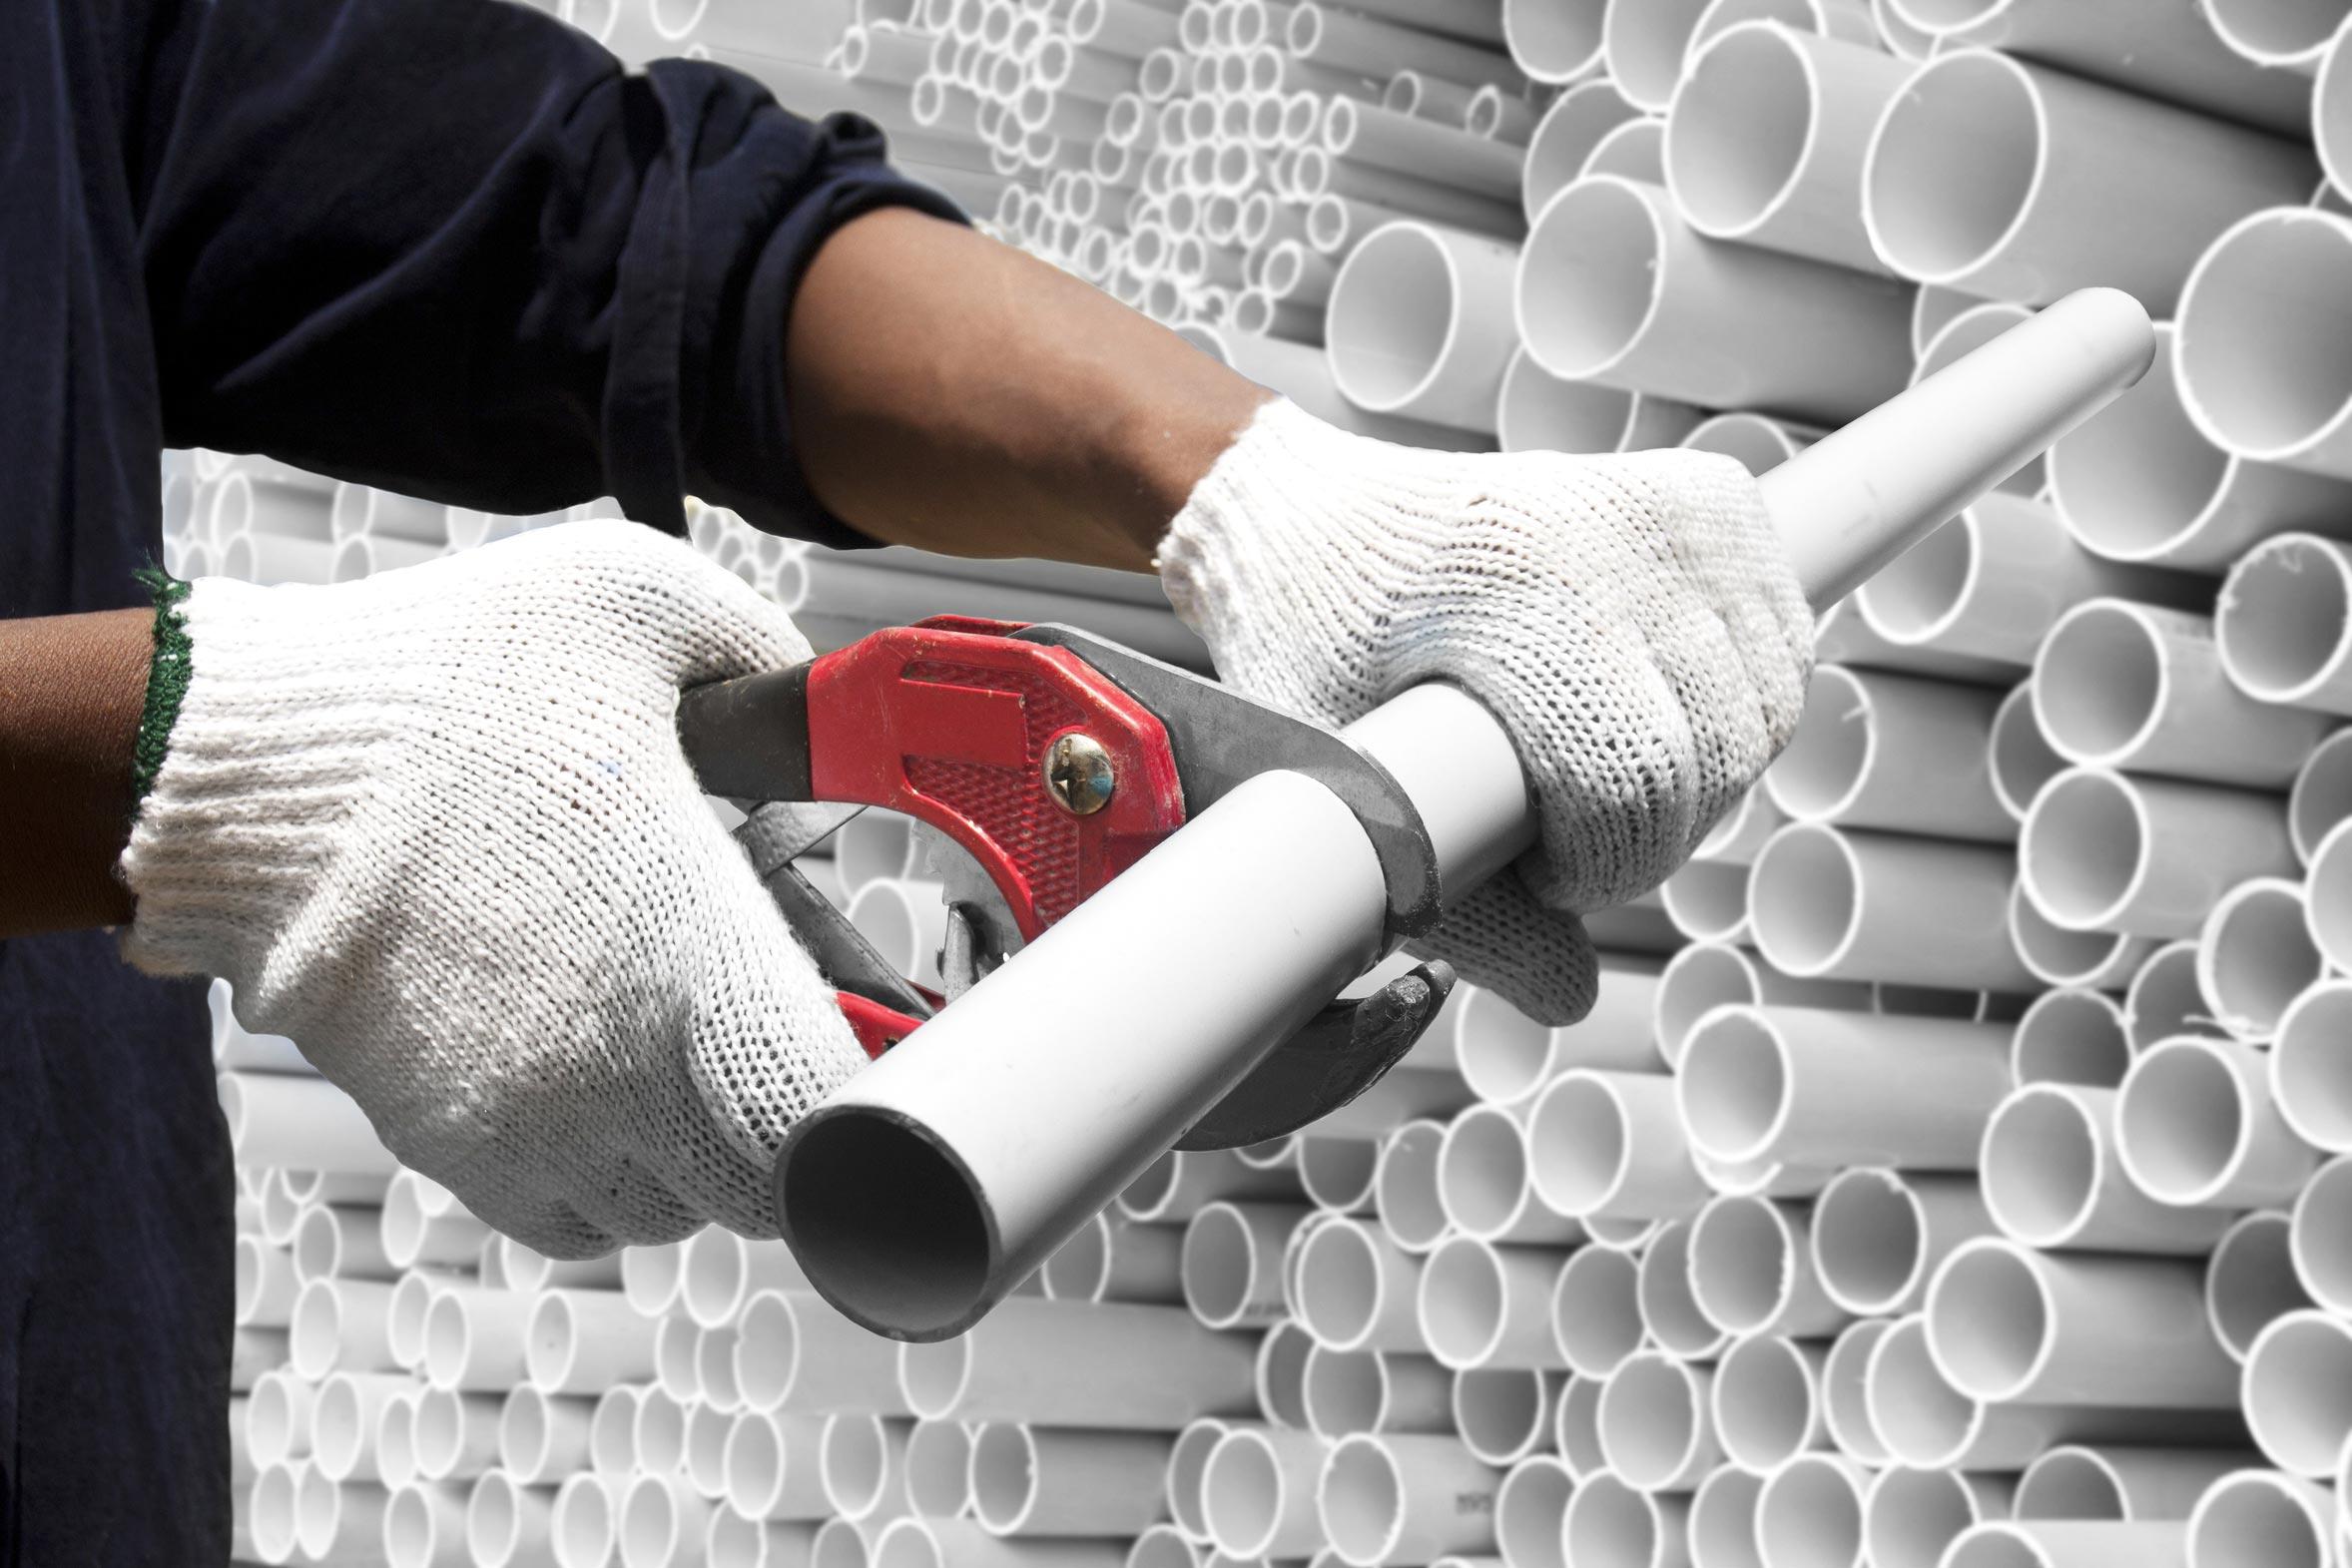 kunststoffschweisser-persoplast-kunststoffrohre